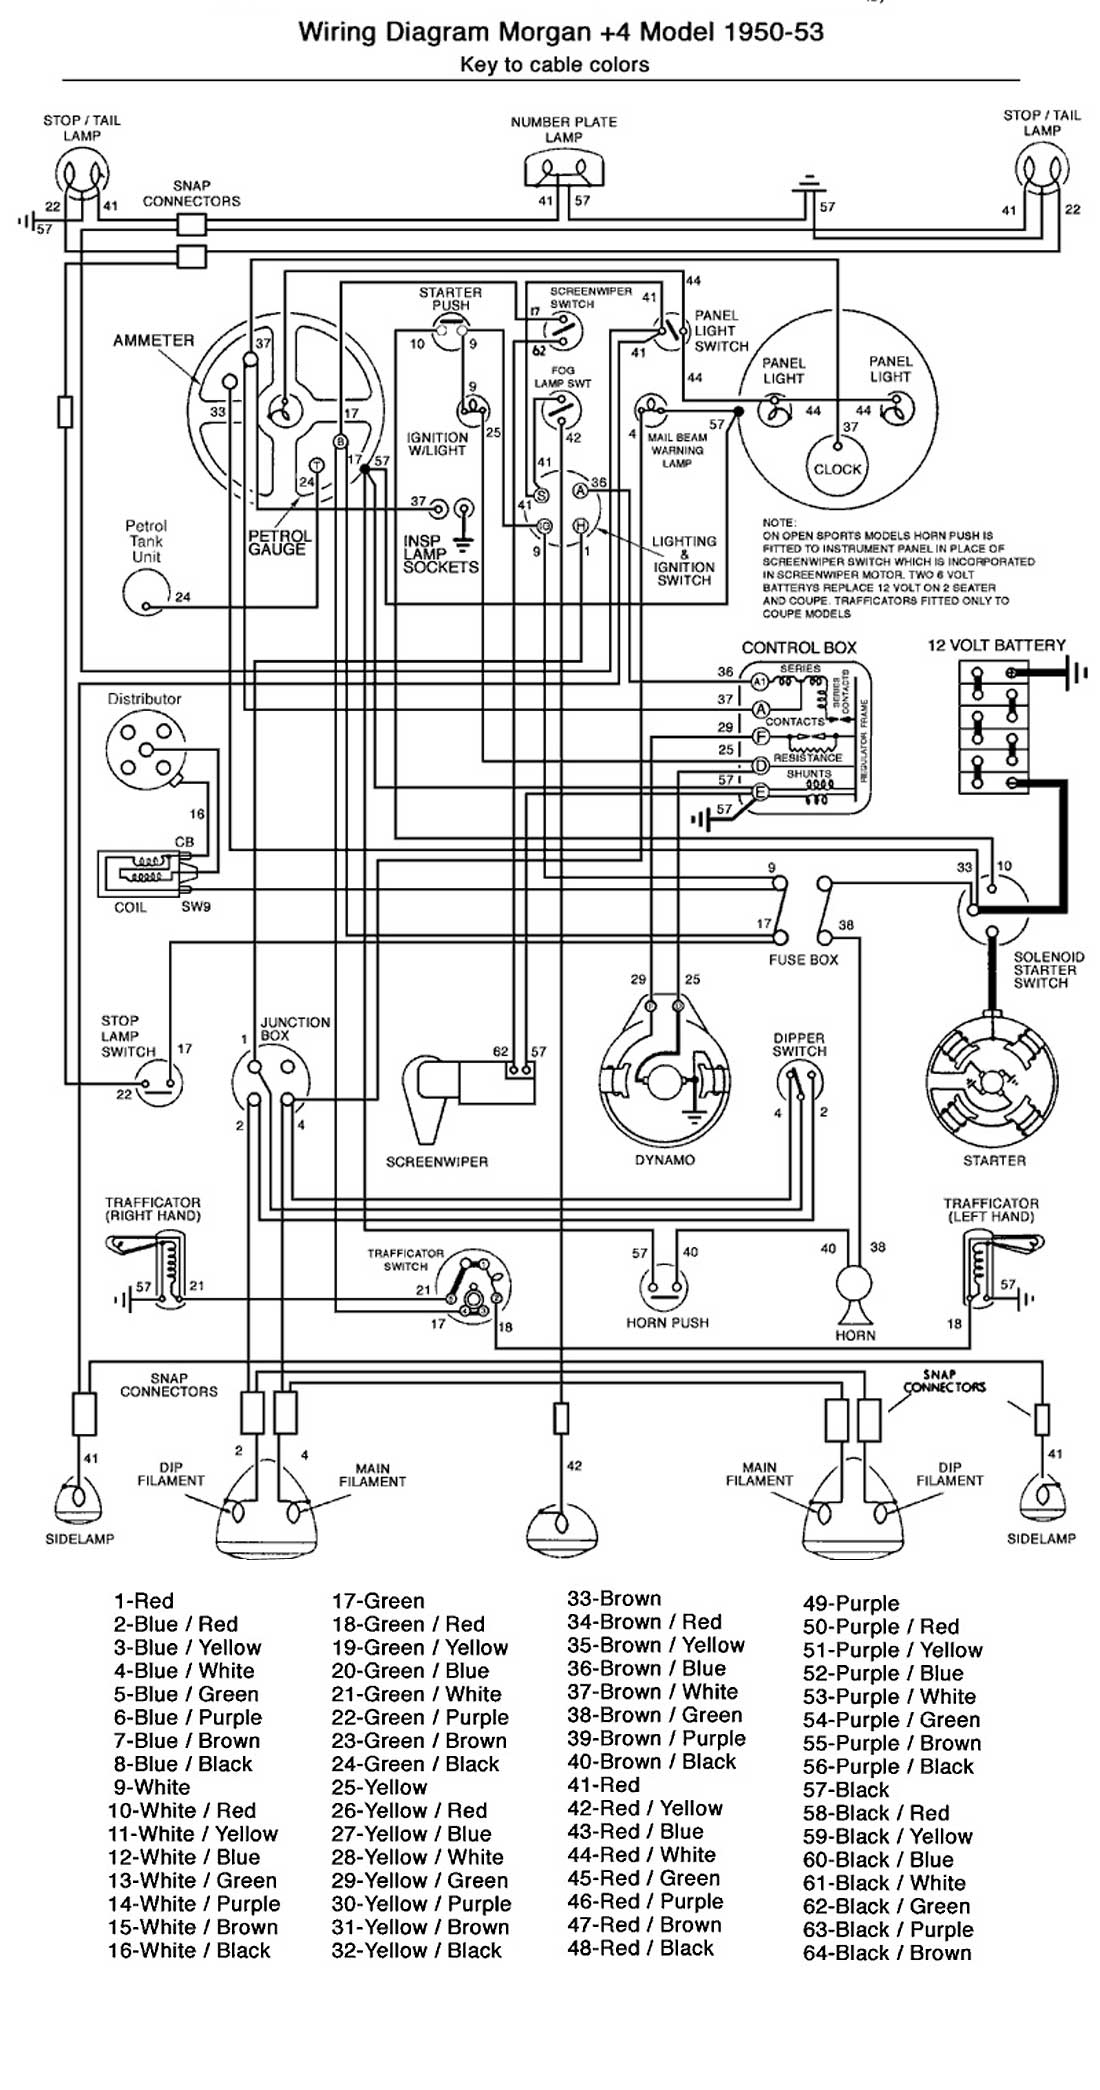 fuse switch wiring diagram renault trafic ecu 2002 morgan 8 box 22 images